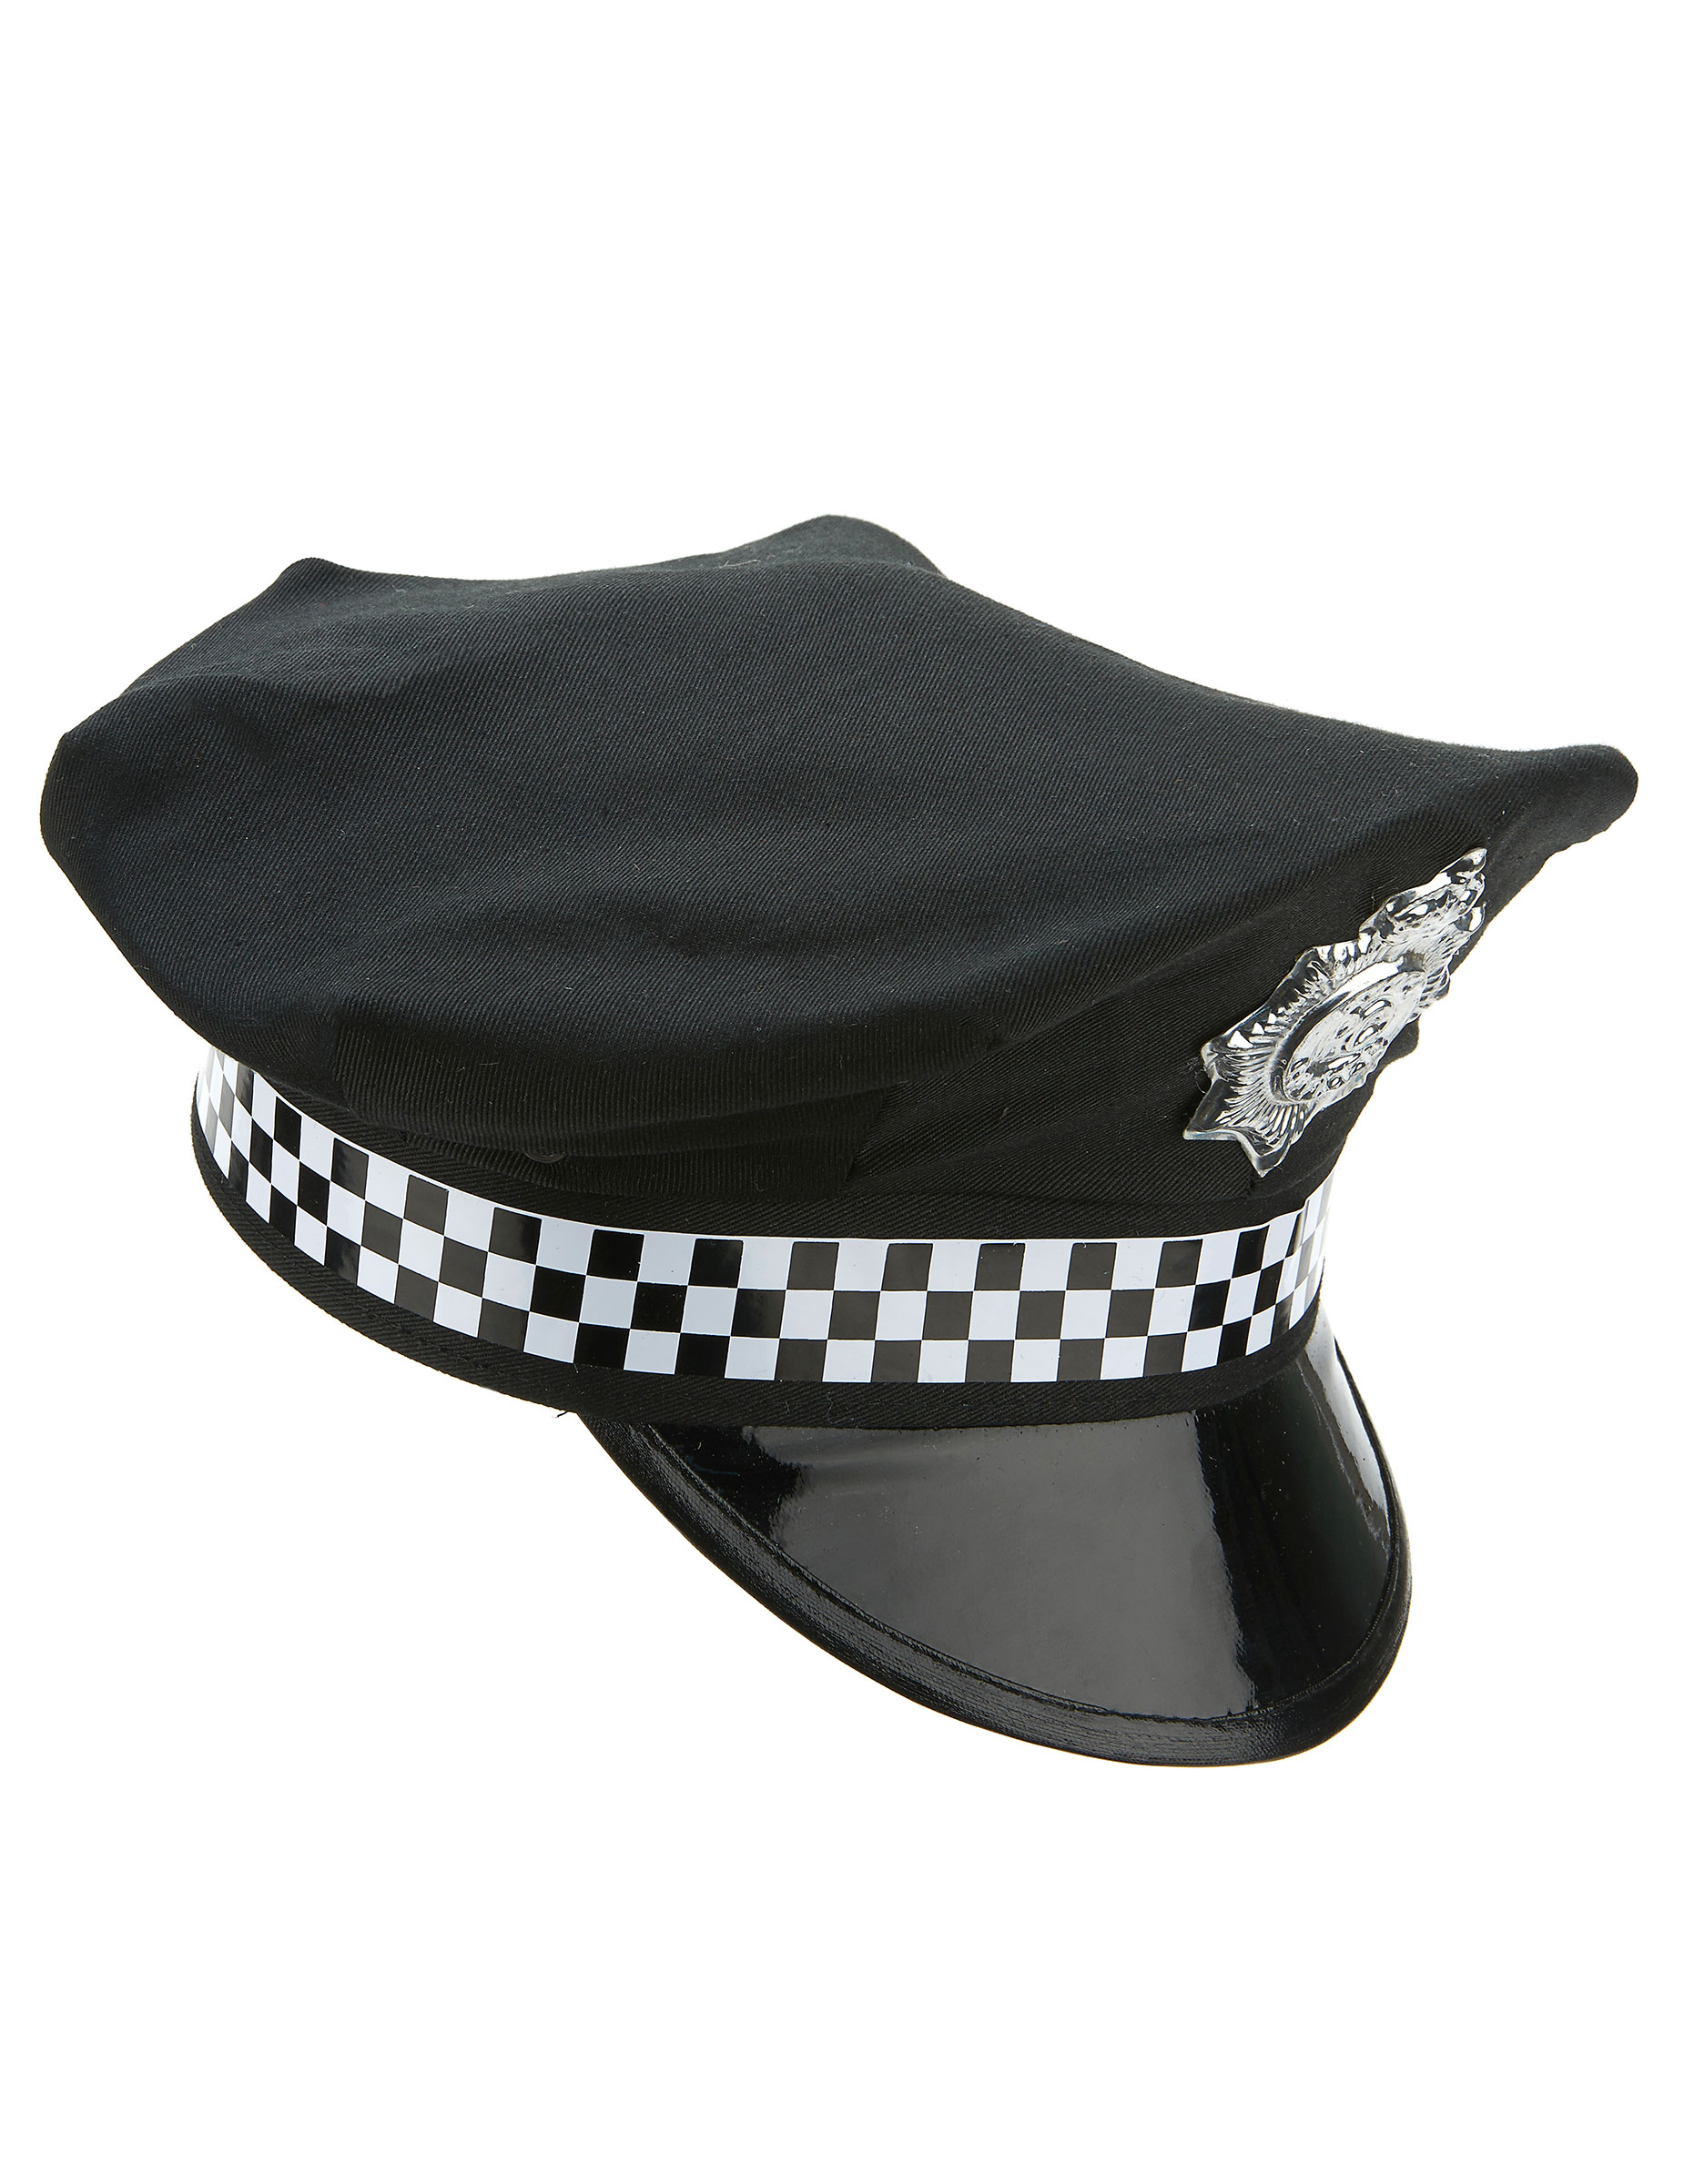 casquette en anglais new style casquette anglaise casquette anglais noir sortie pas cher en ligne. Black Bedroom Furniture Sets. Home Design Ideas